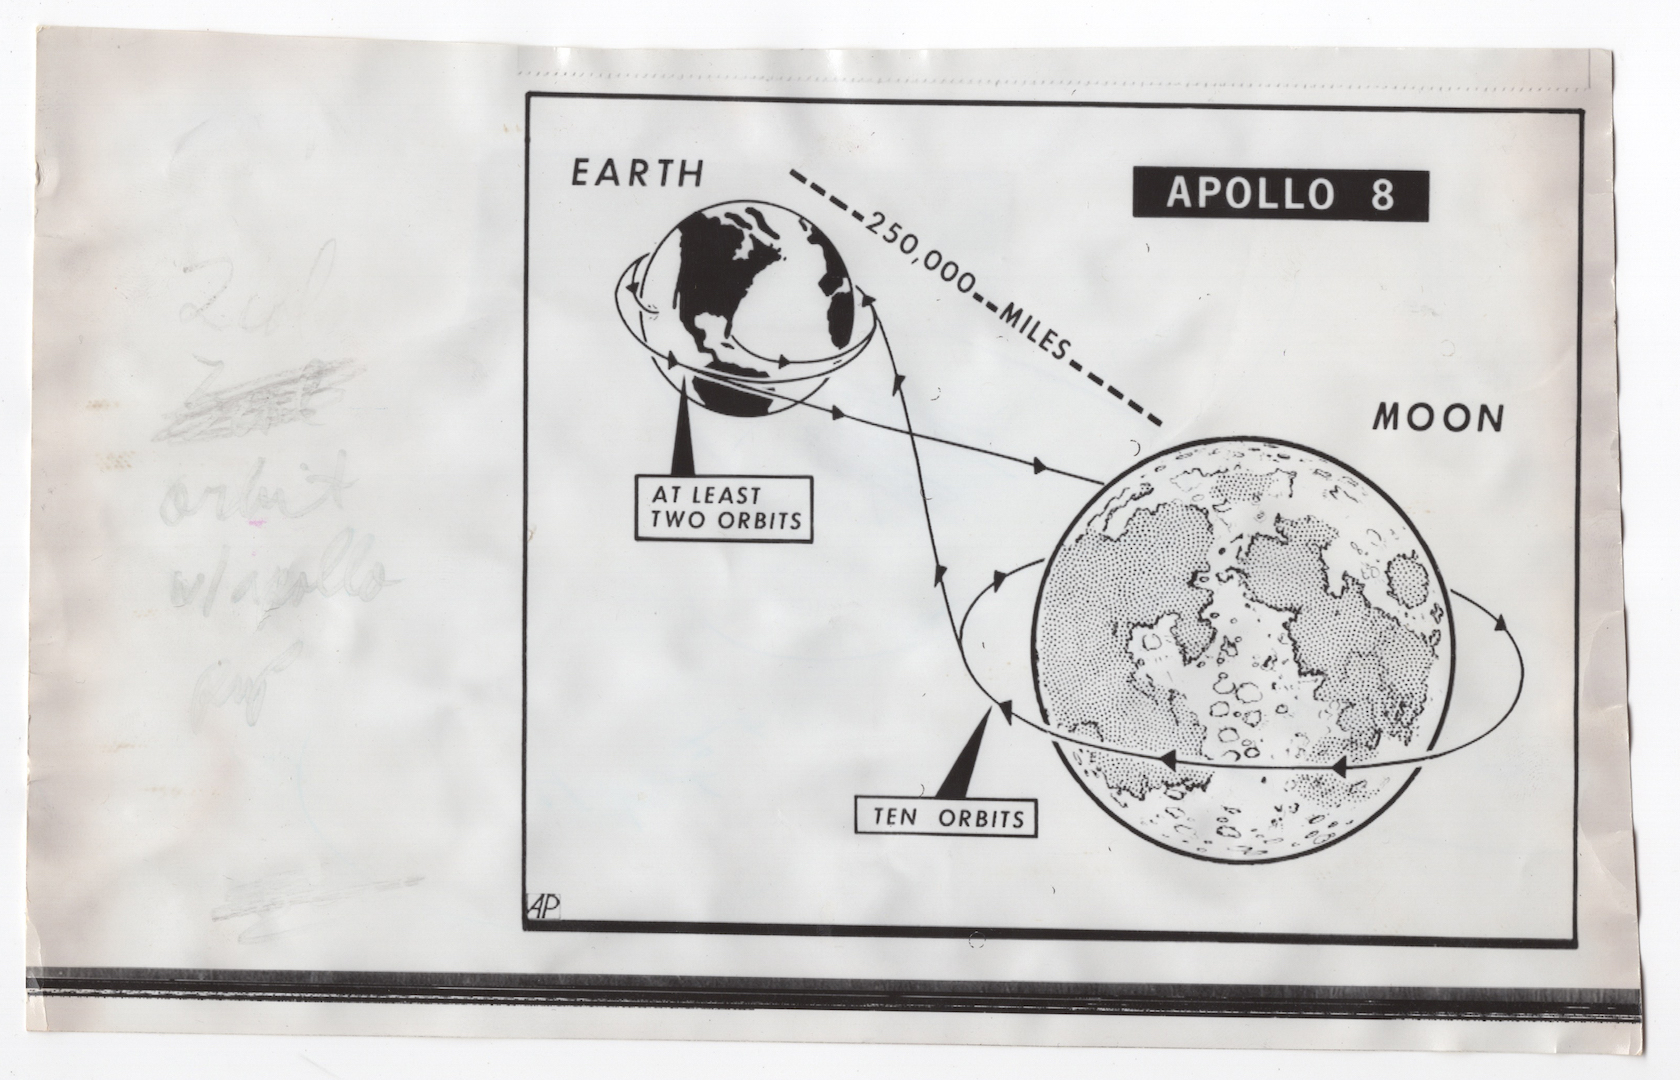 ERM-1968-PRINT-NOSP0790-FRONT.jpg